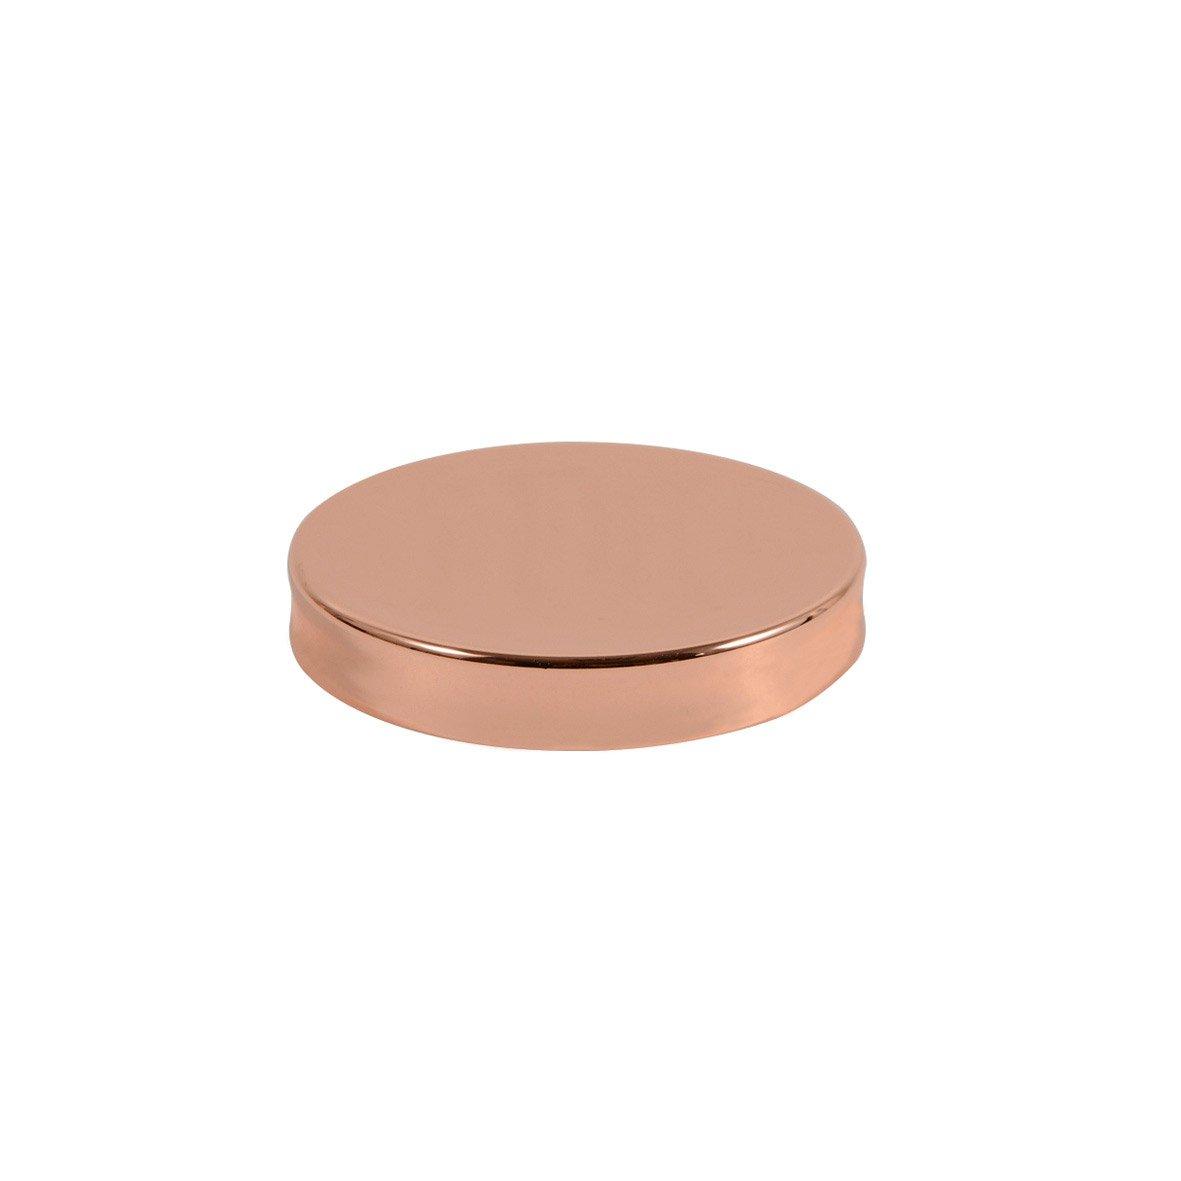 Portesavon Métal Copper Cuivre Leroy Merlin - Porte savon leroy merlin